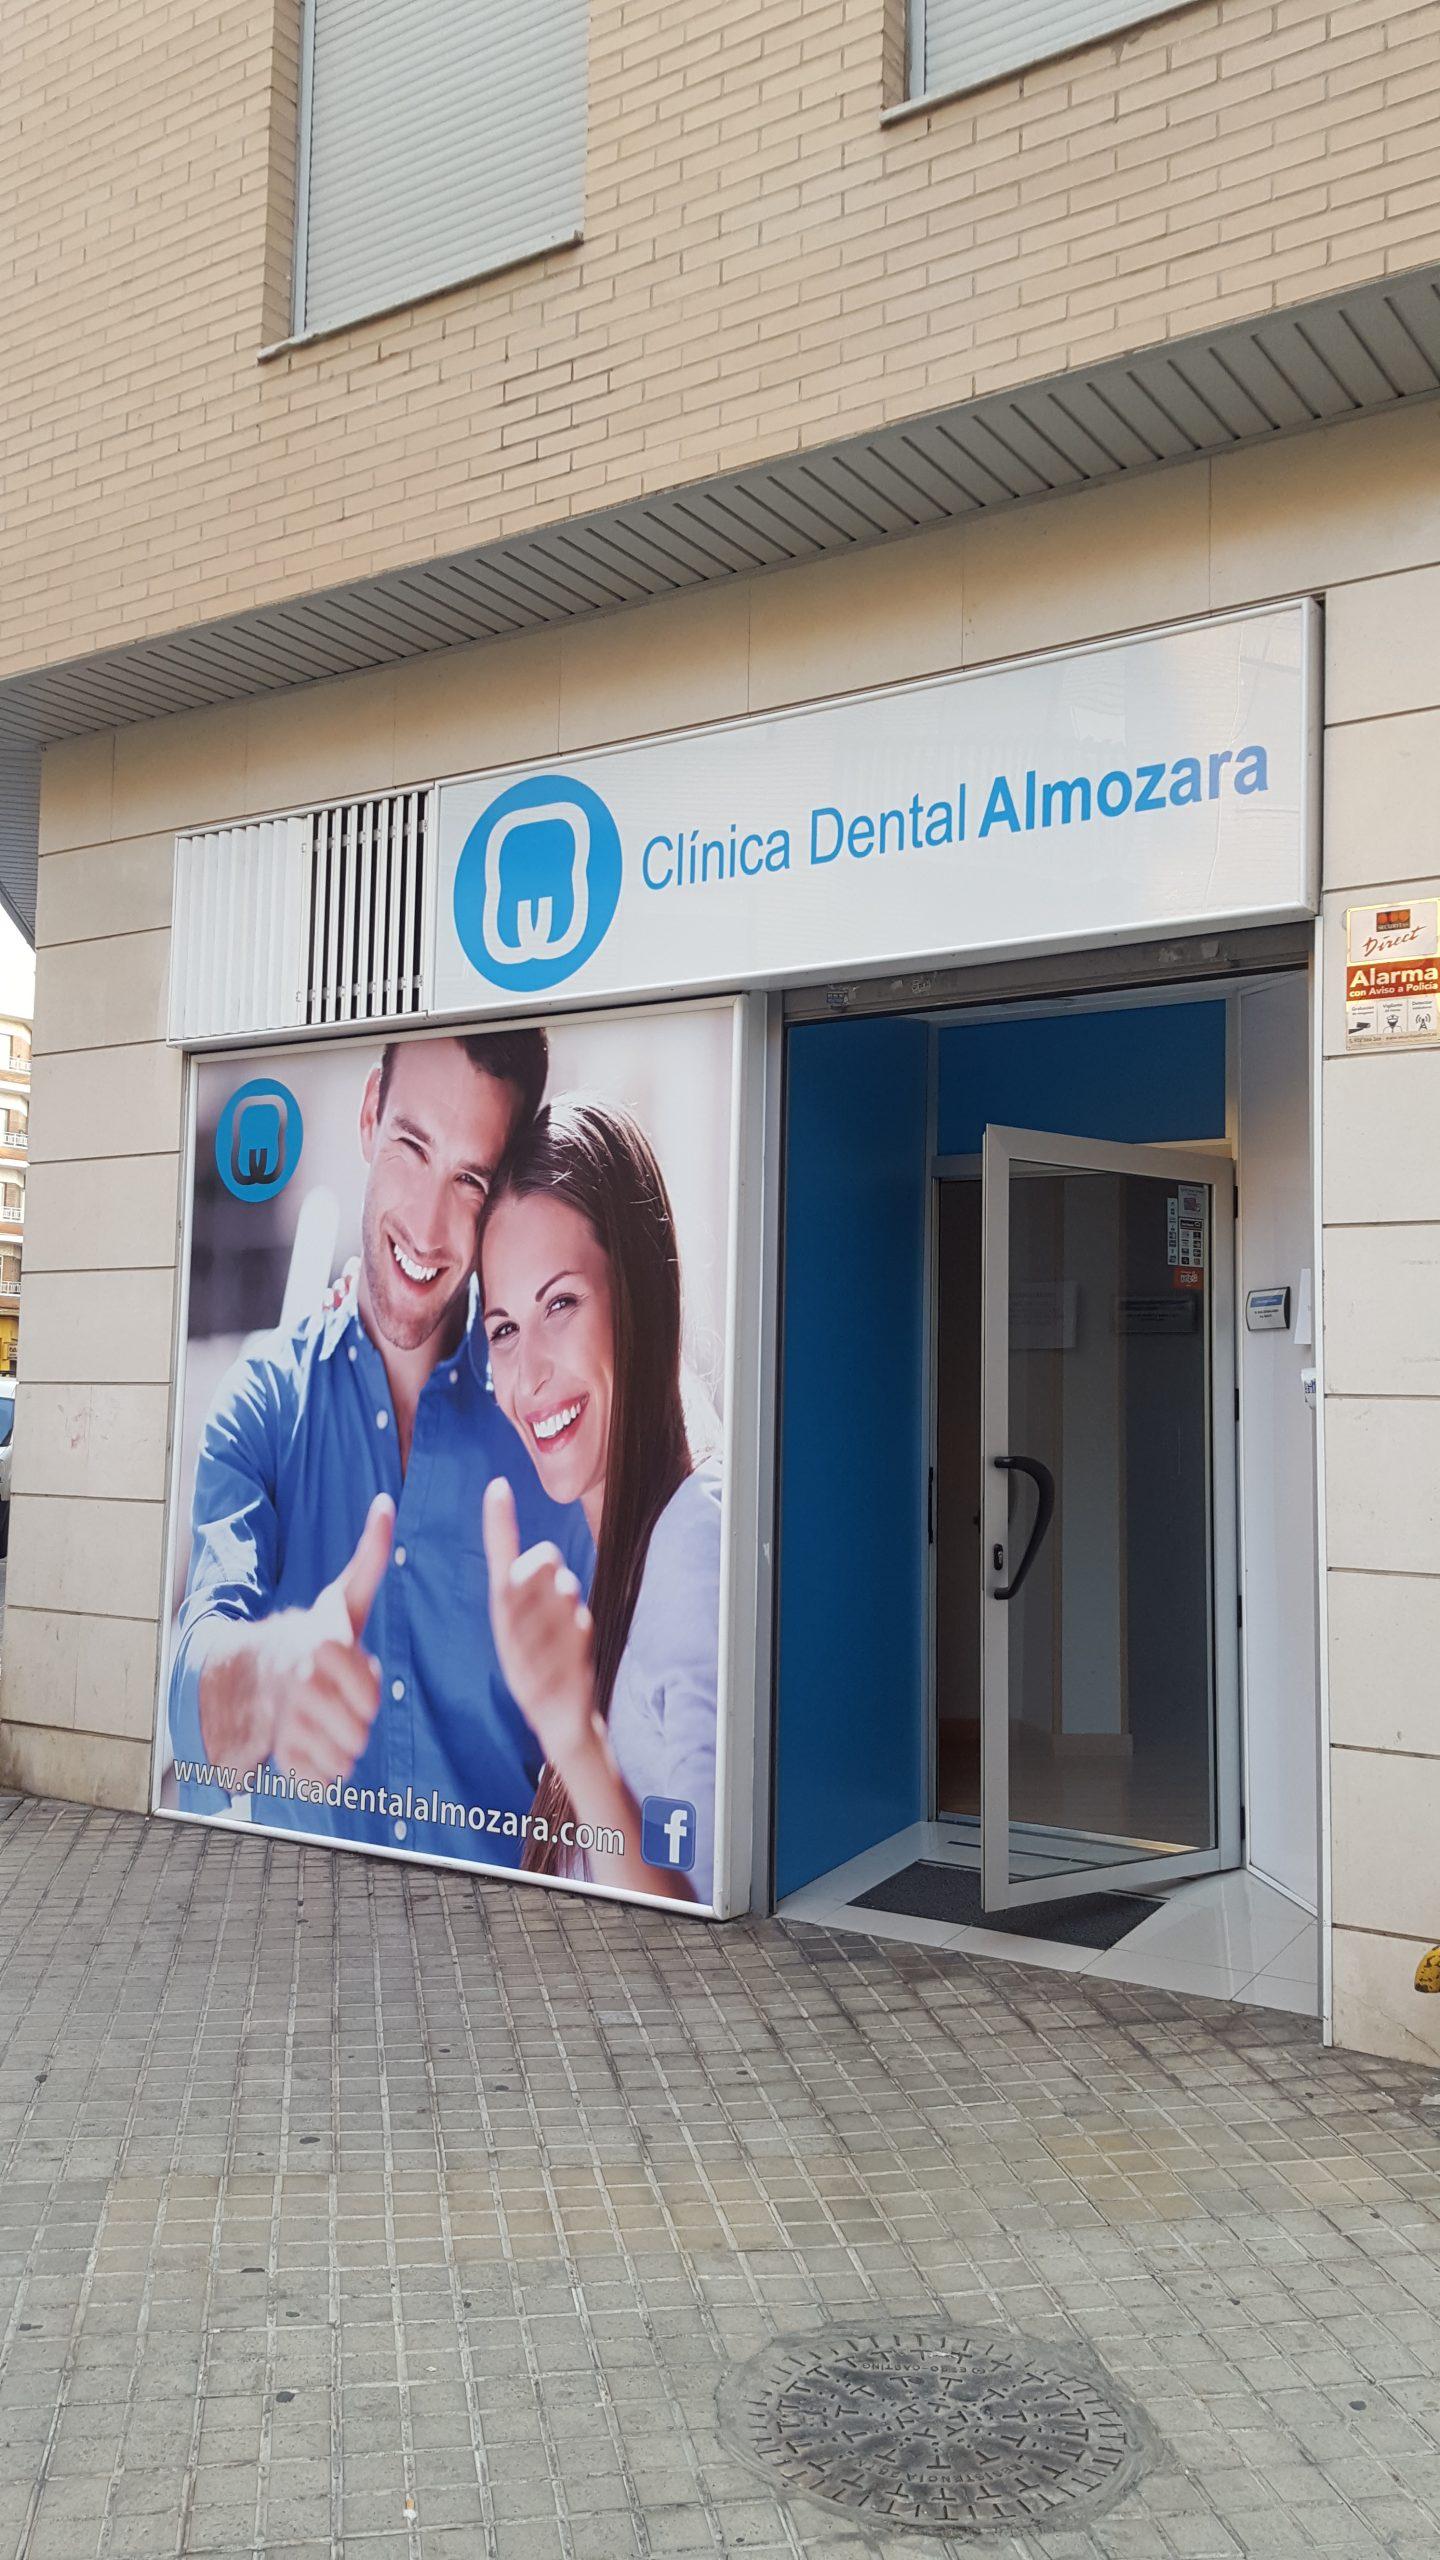 clinica dental almozara